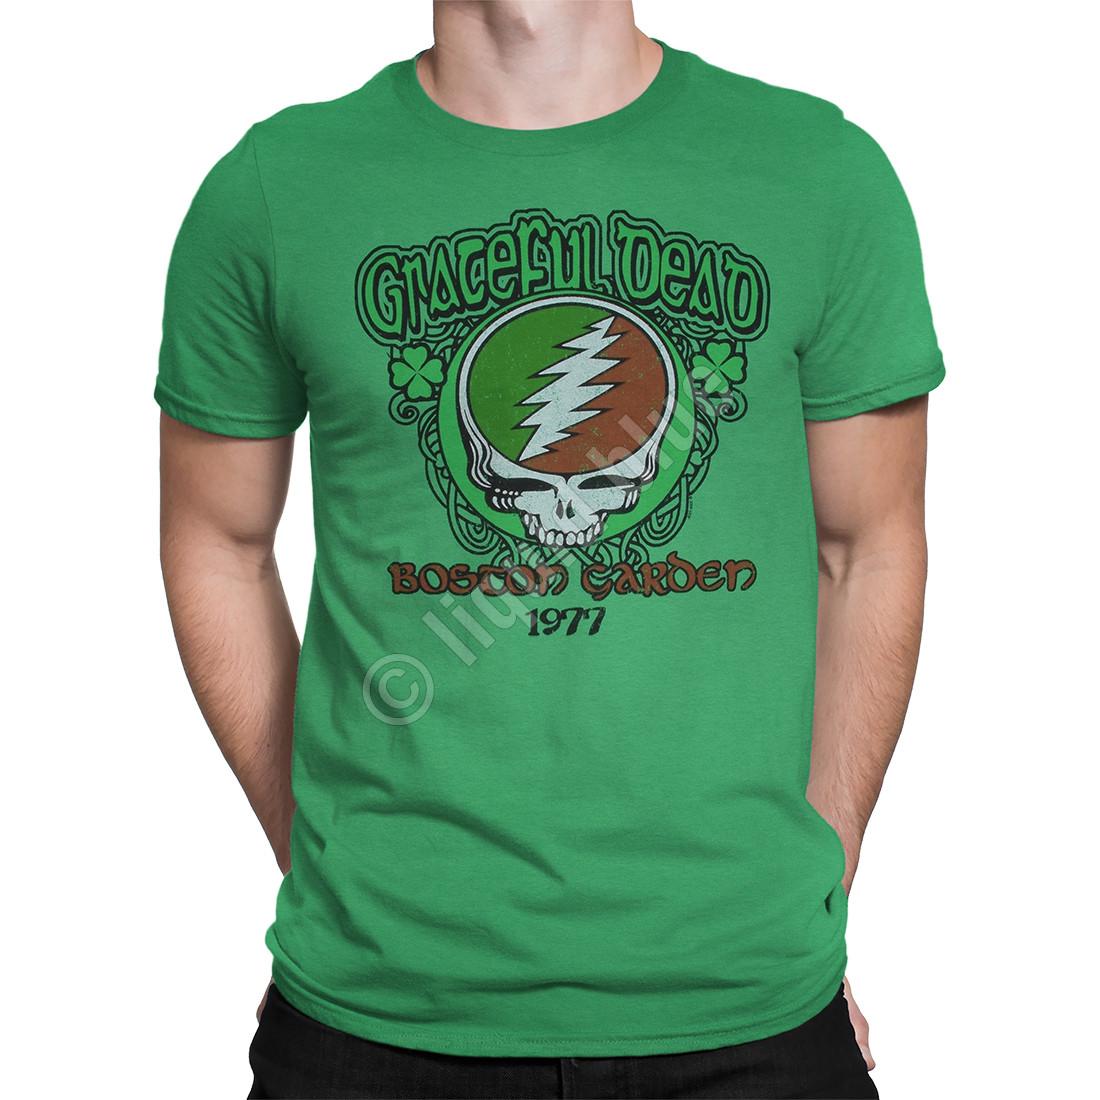 Shamrock 77 Green T-Shirt